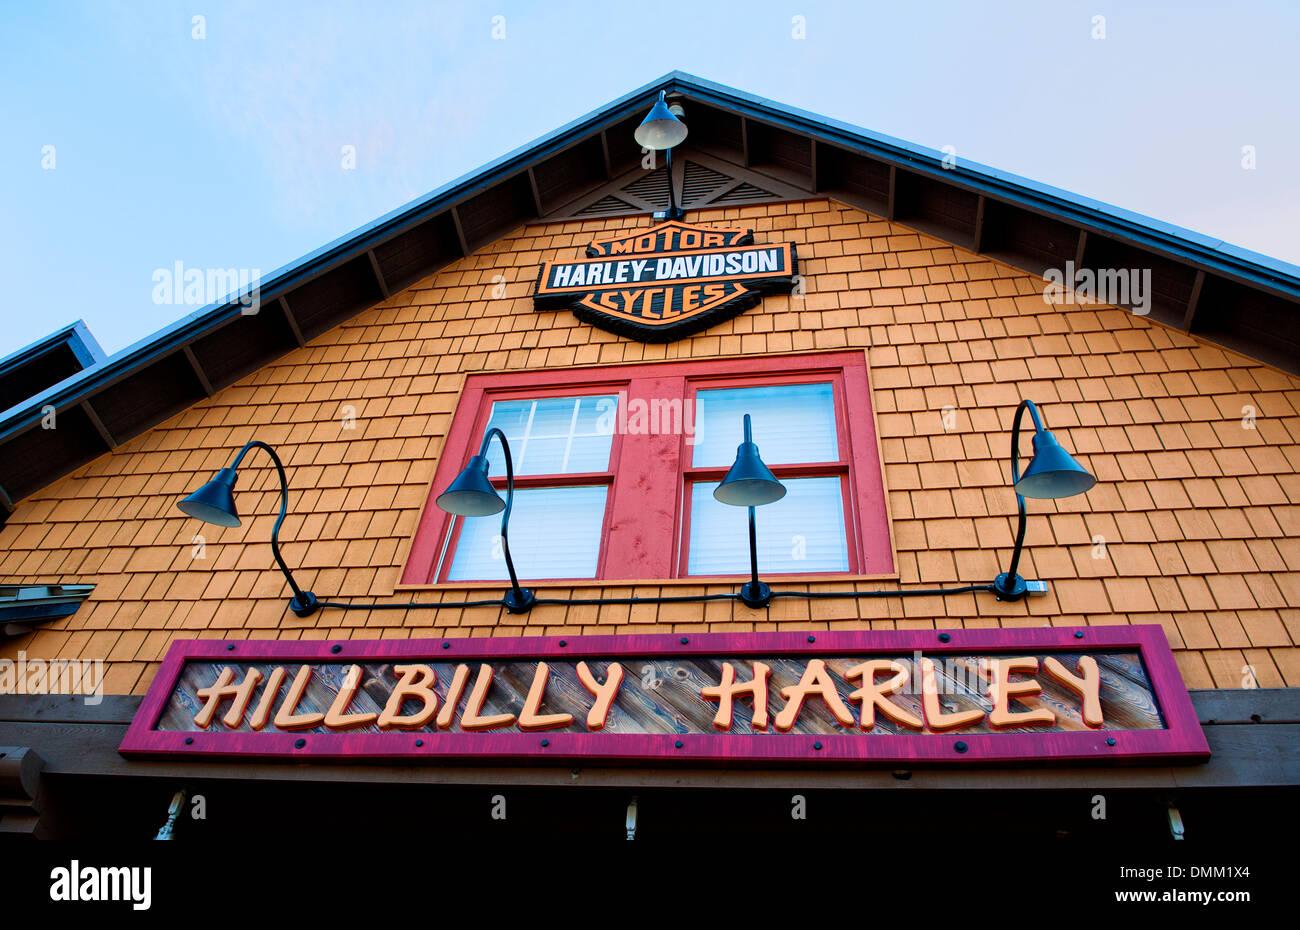 Hillbilly Harley Davidson storefront in Gatlinburg, Tennessee Stock